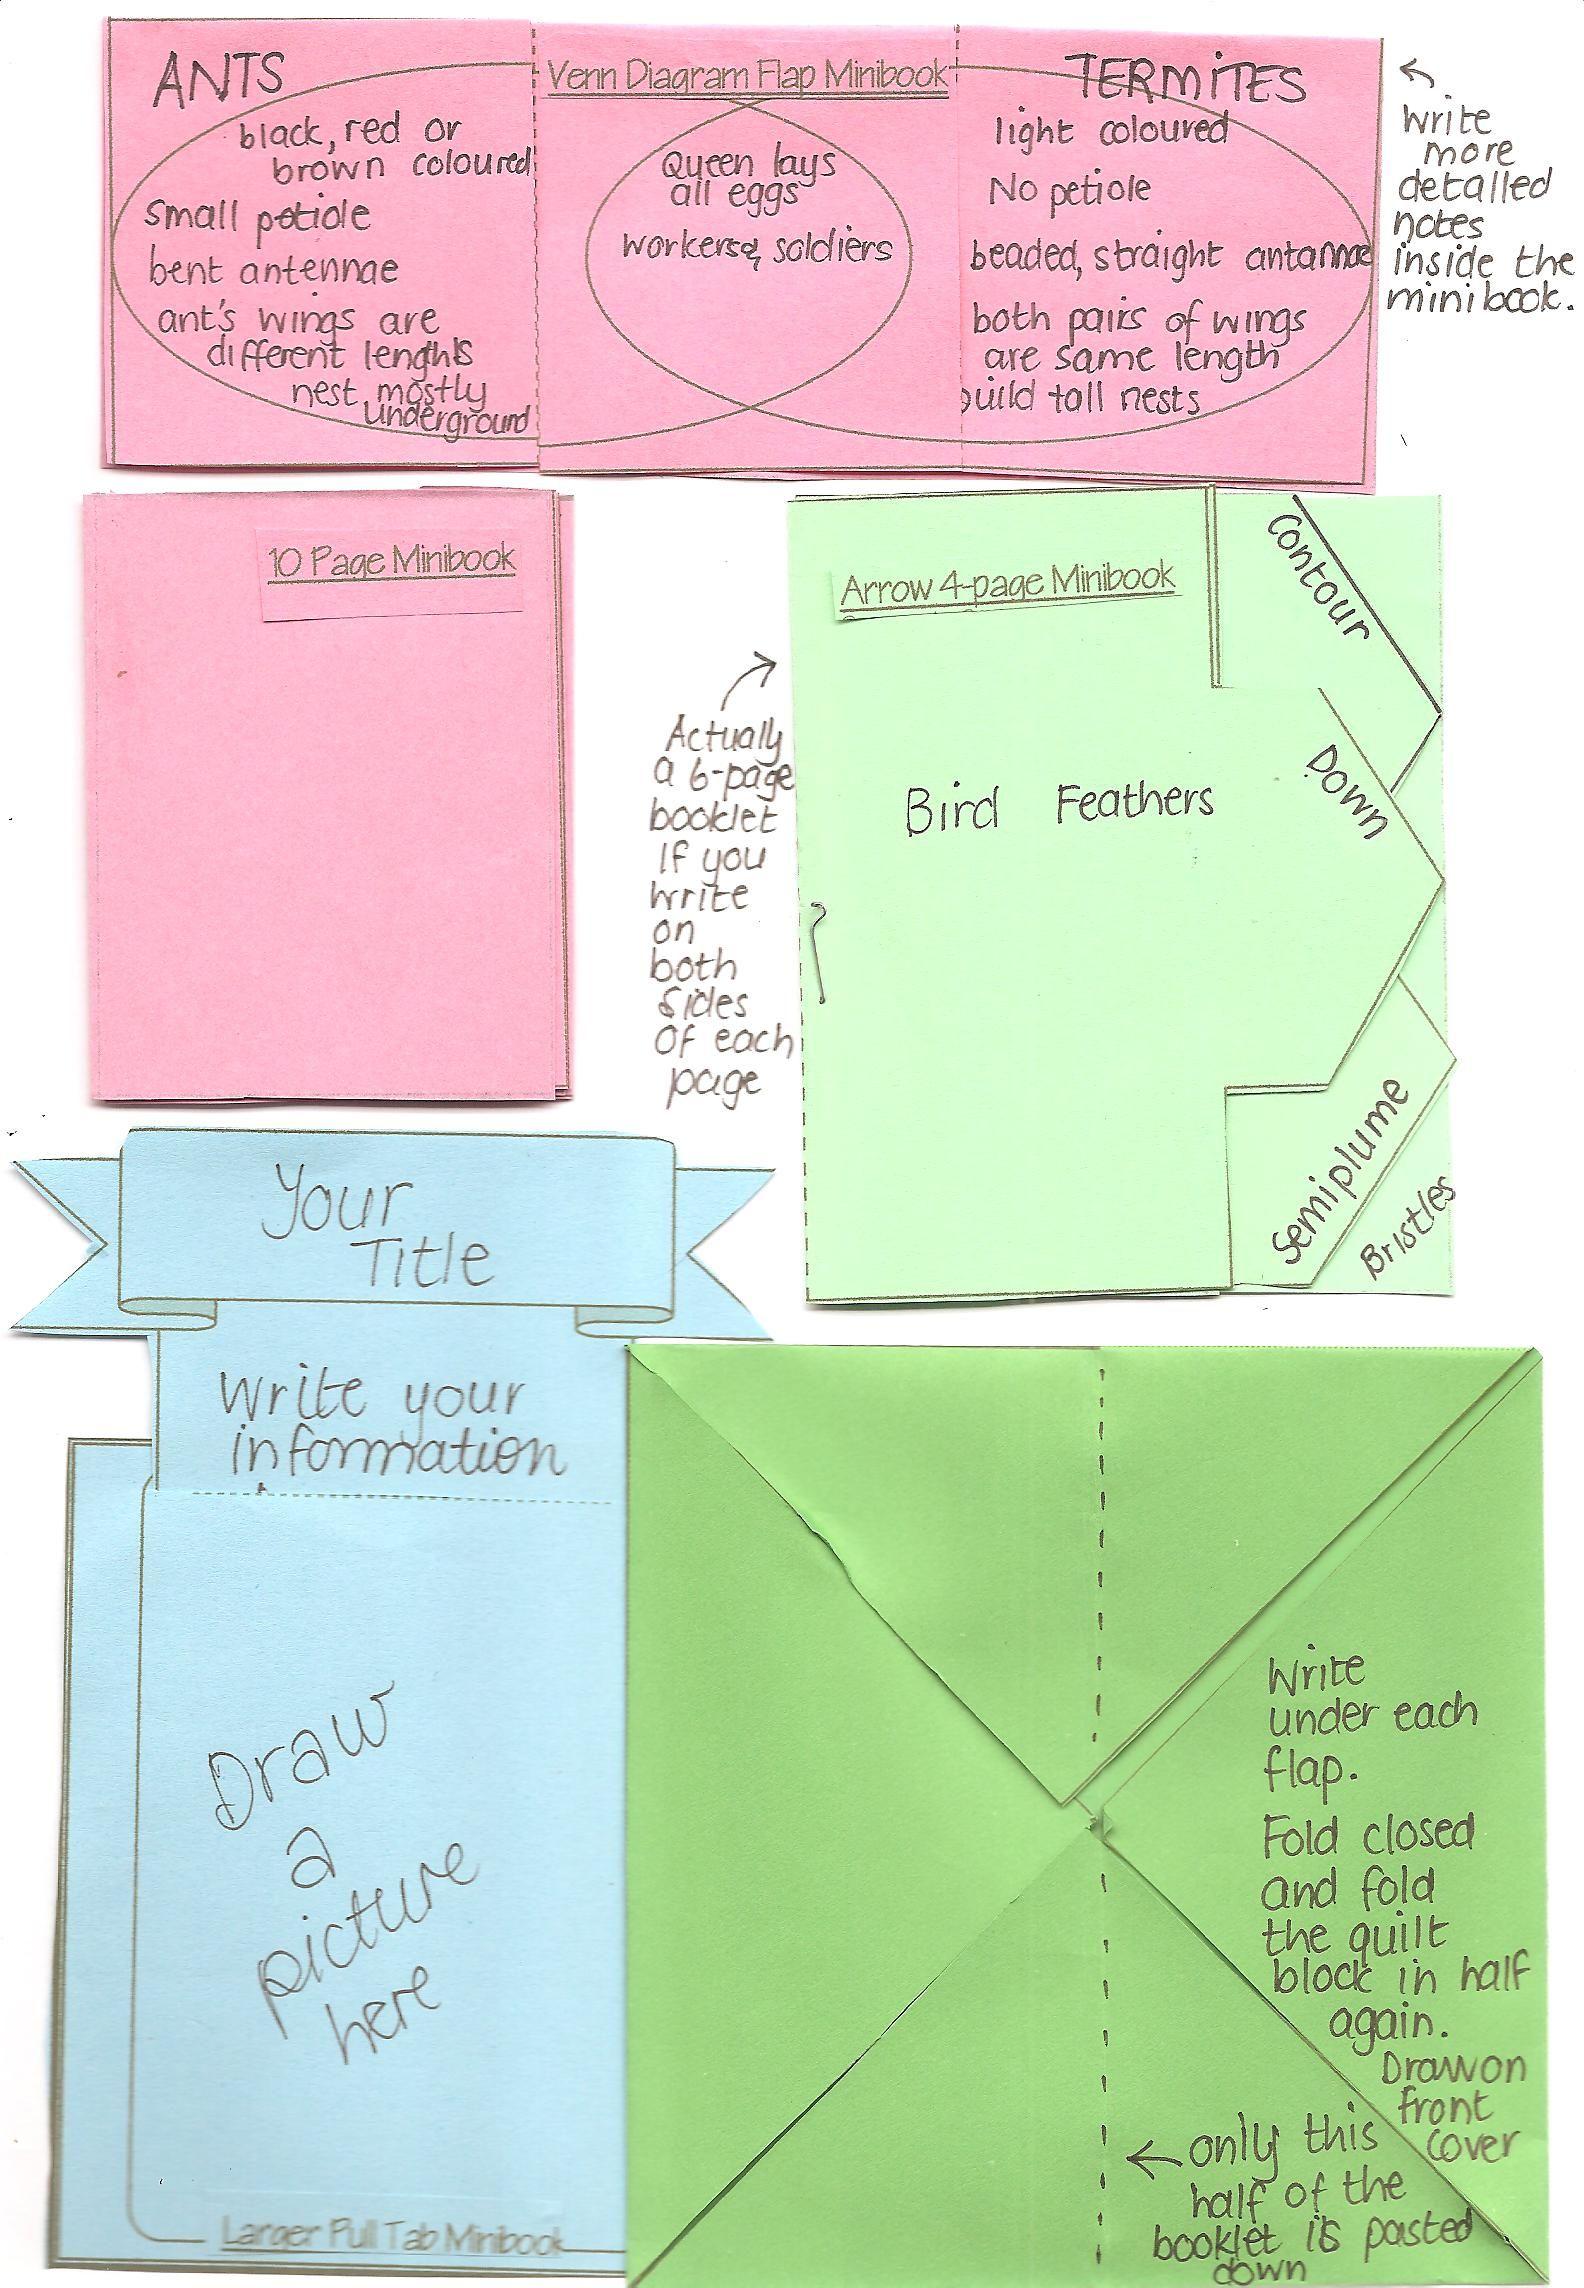 practicalpages.files.wordpress.com 2010 11 blog-new-minibooks-001 ...